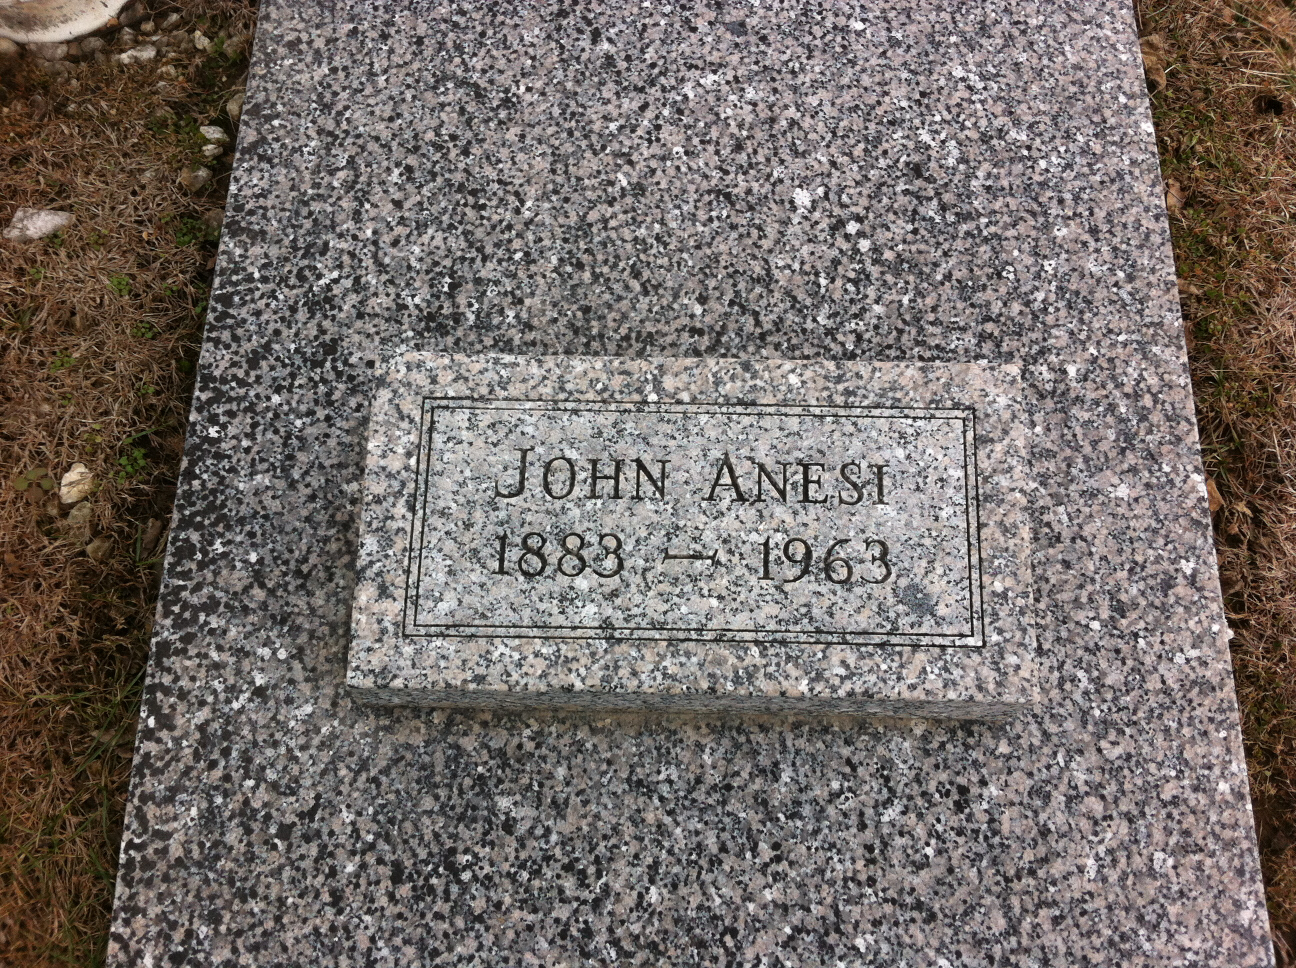 John Anesi